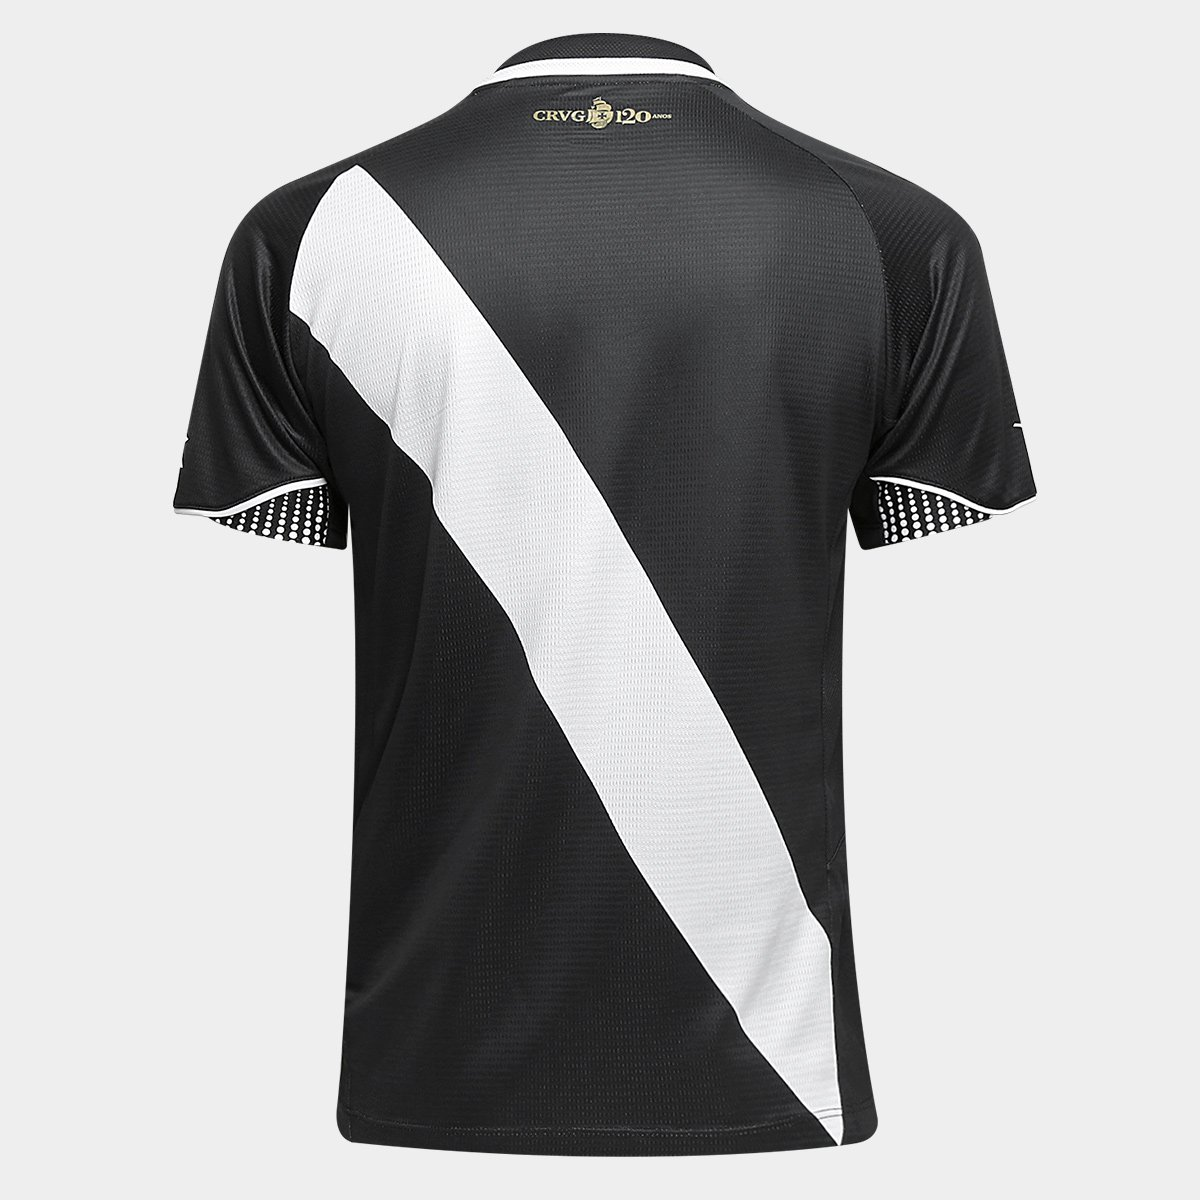 69bc4c76ae Camisa Vasco I 2018 s n° - Torcedor Diadora Masculina - Preto ...